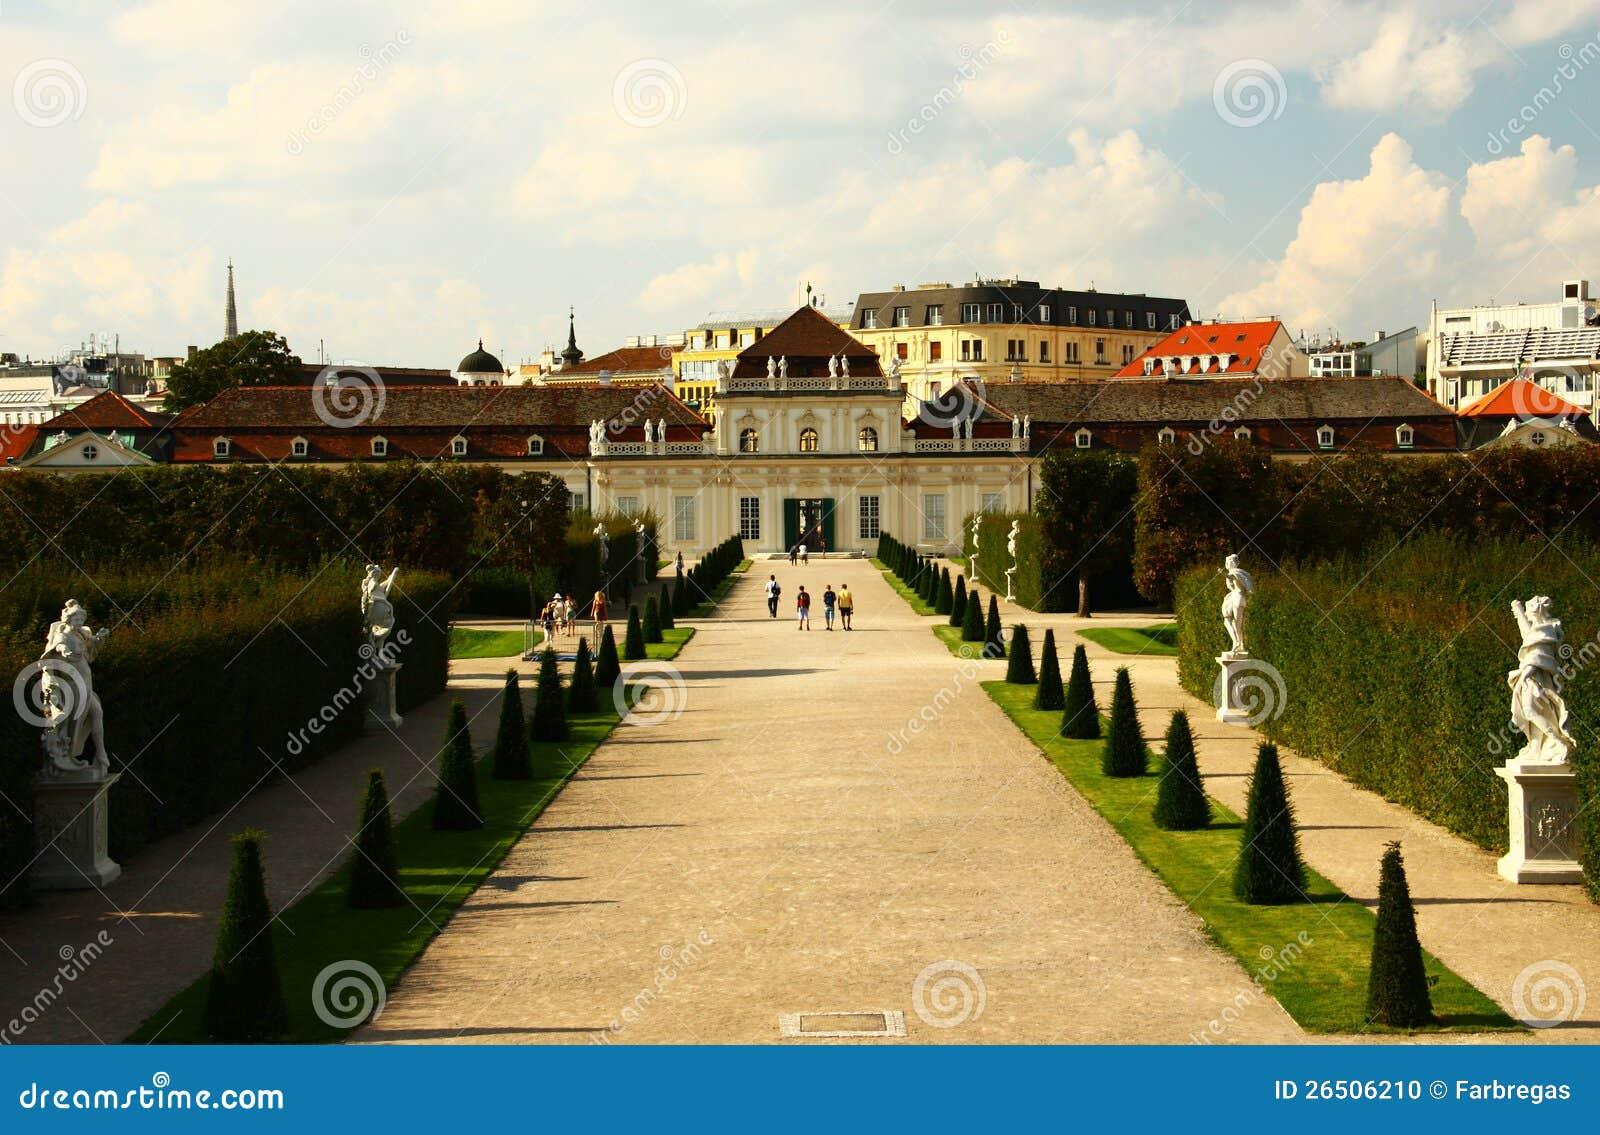 Palácio do Belvedere, Viena